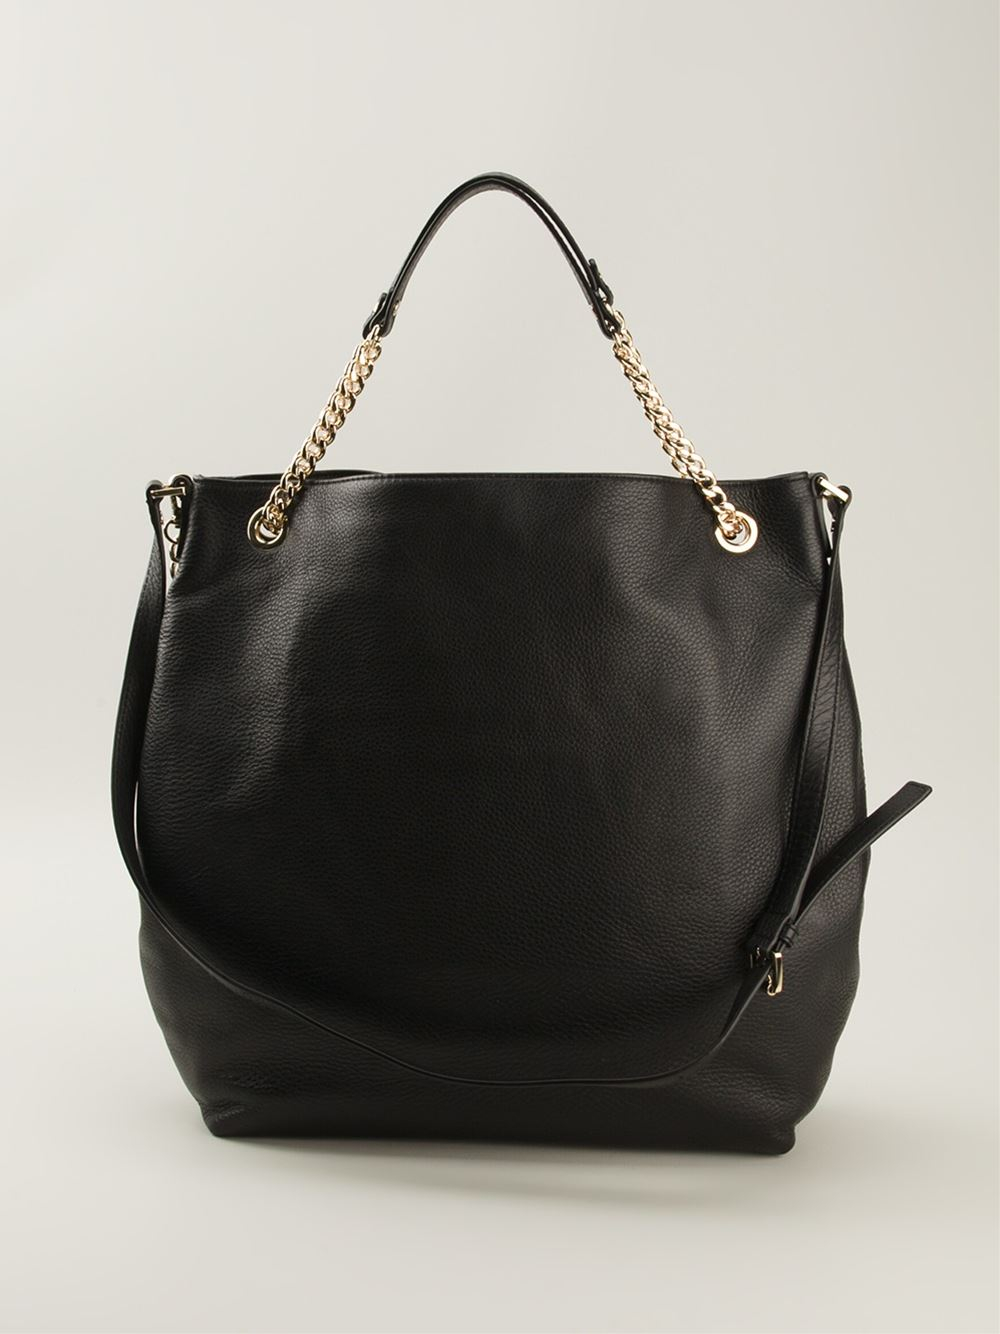 Lyst - MICHAEL Michael Kors Chain Handles Slouchy Tote Bag in Black f977d61bd